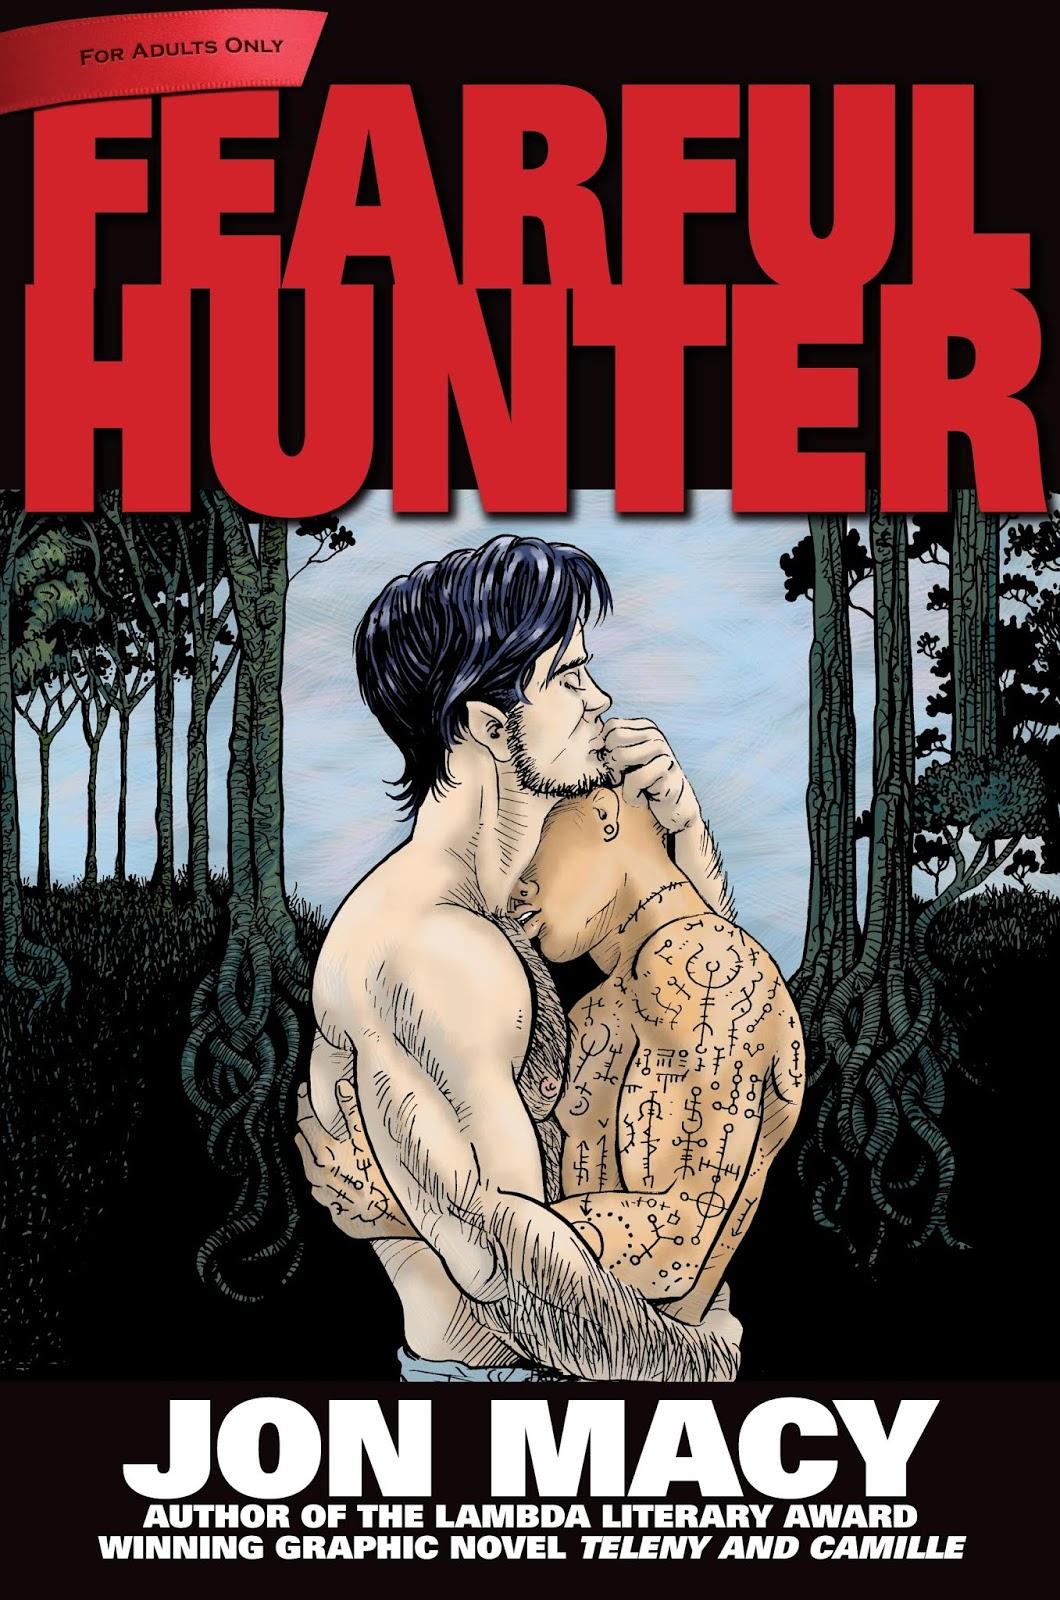 Fearful Hunter [Jon Macy] [Español]